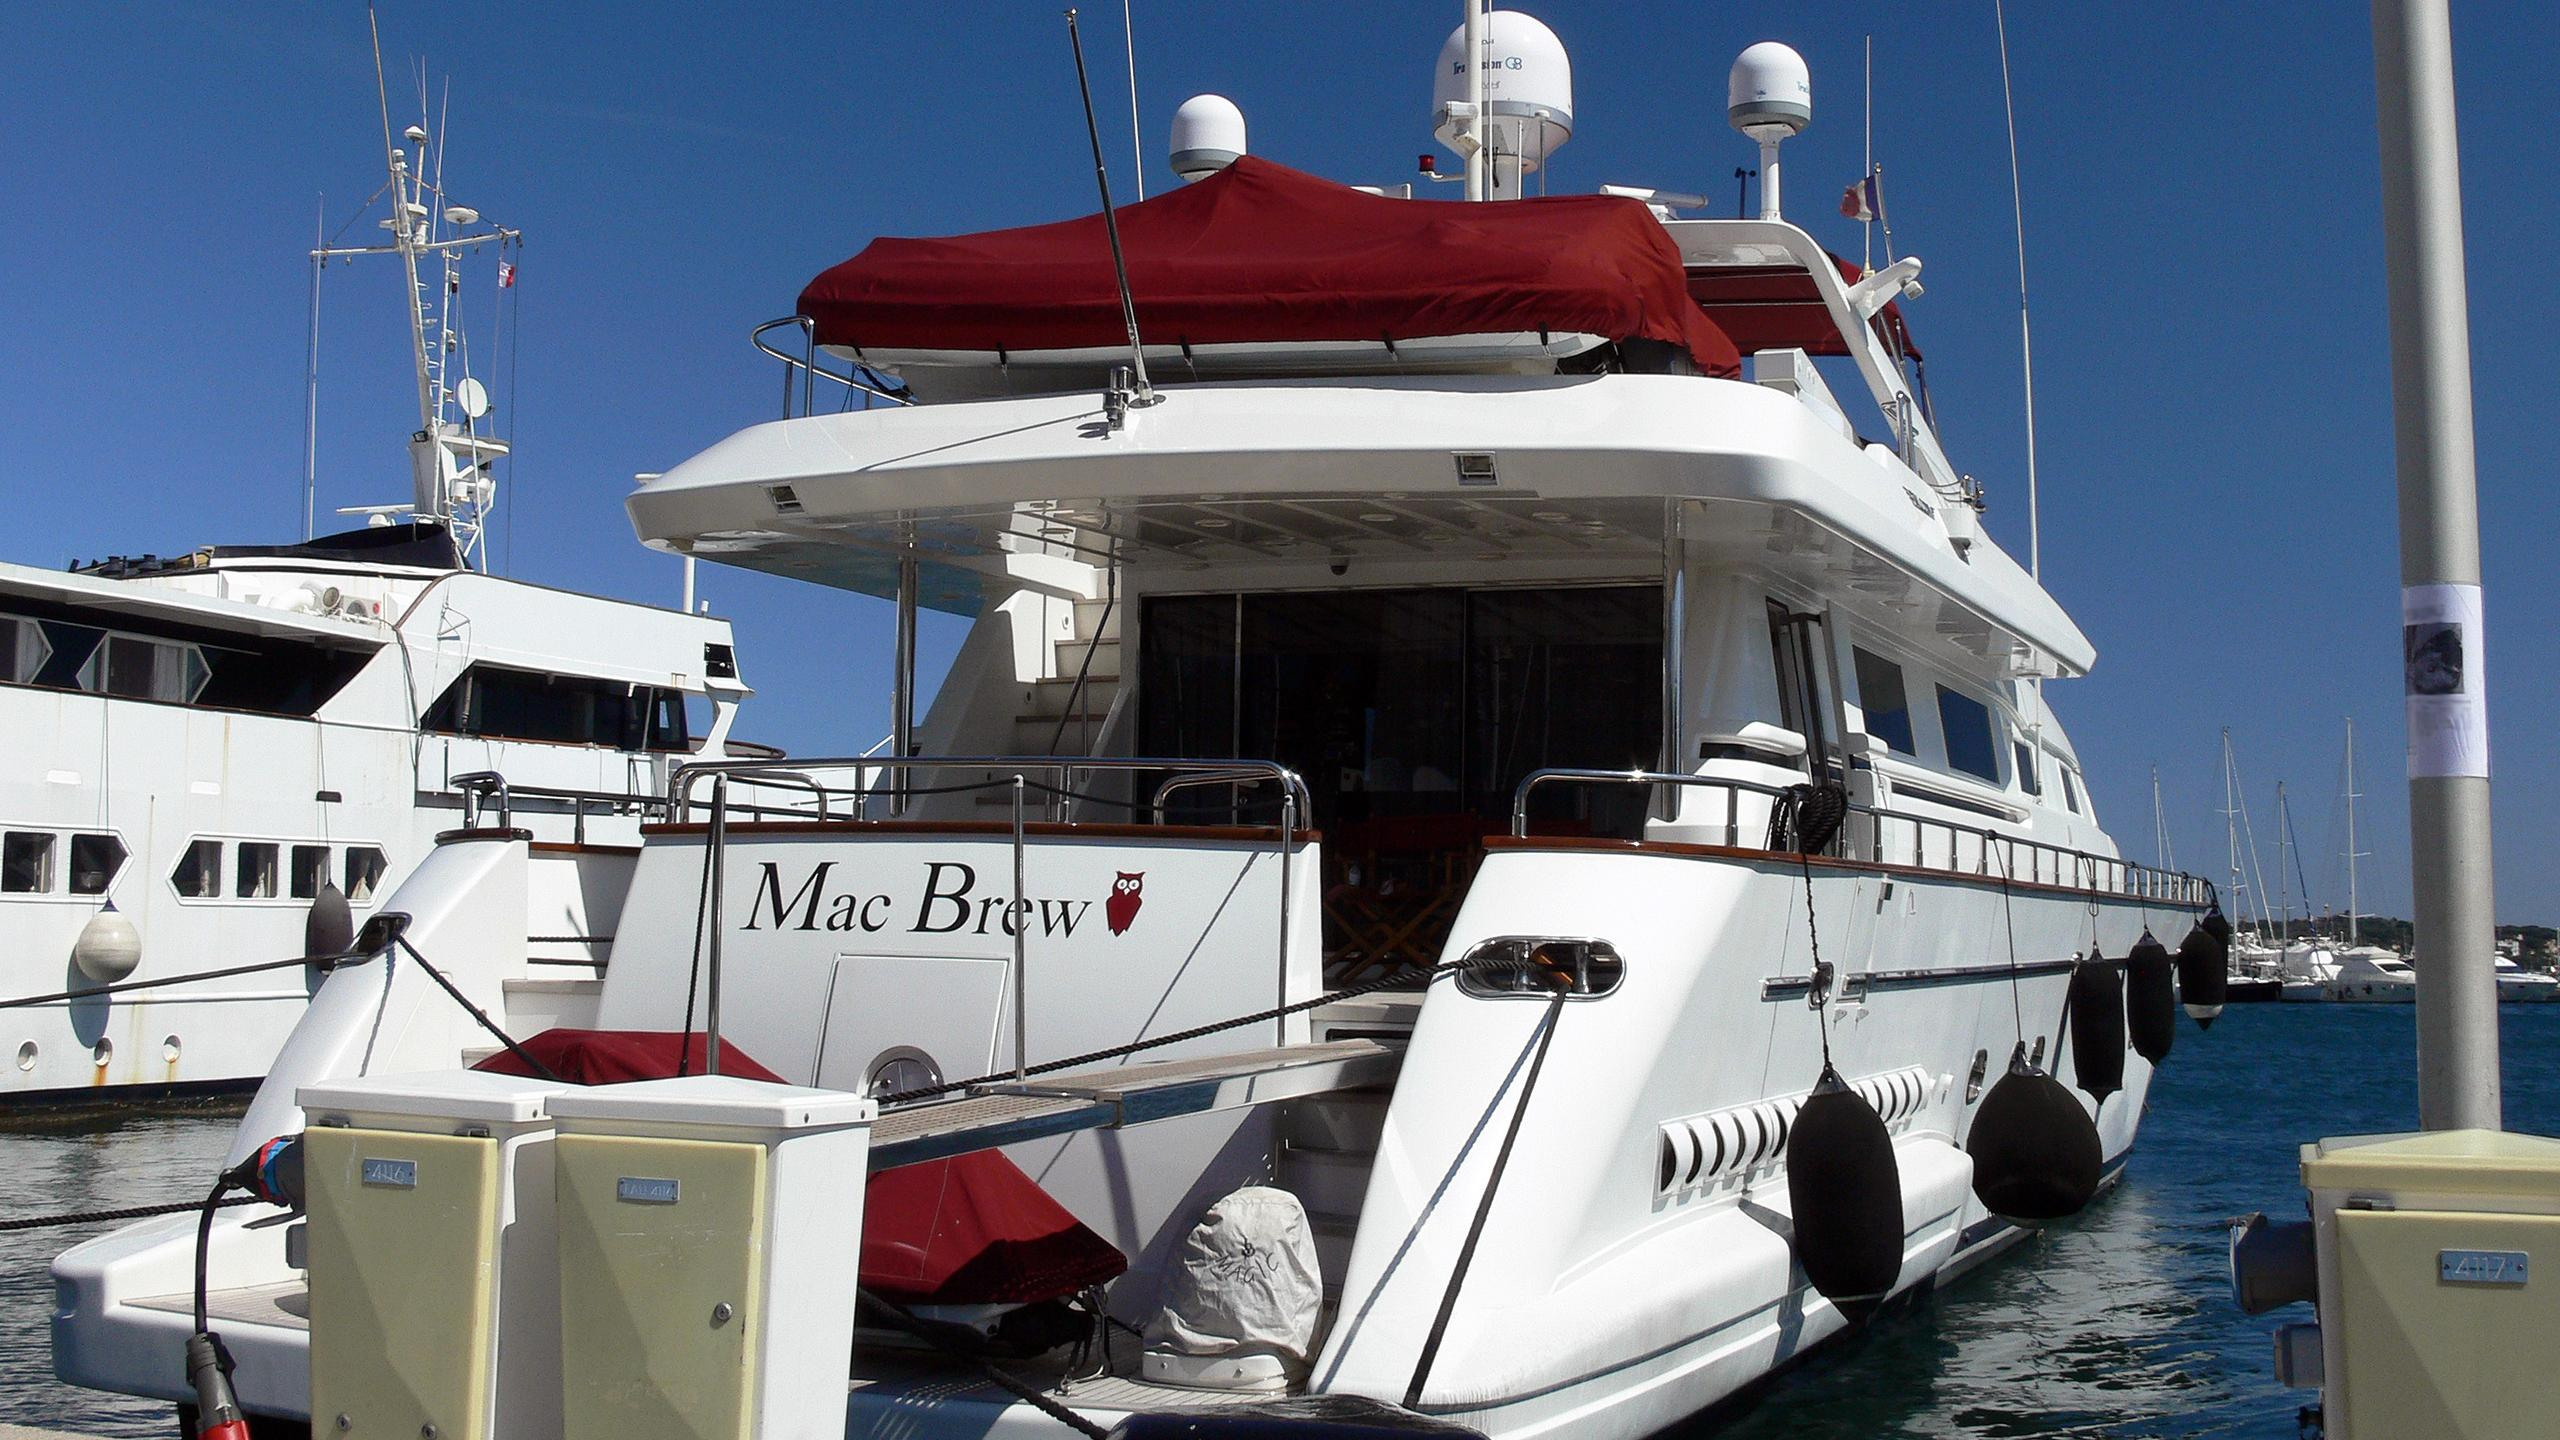 the-rock-motor-yacht-falcon-100-2000-31m-moored-stern